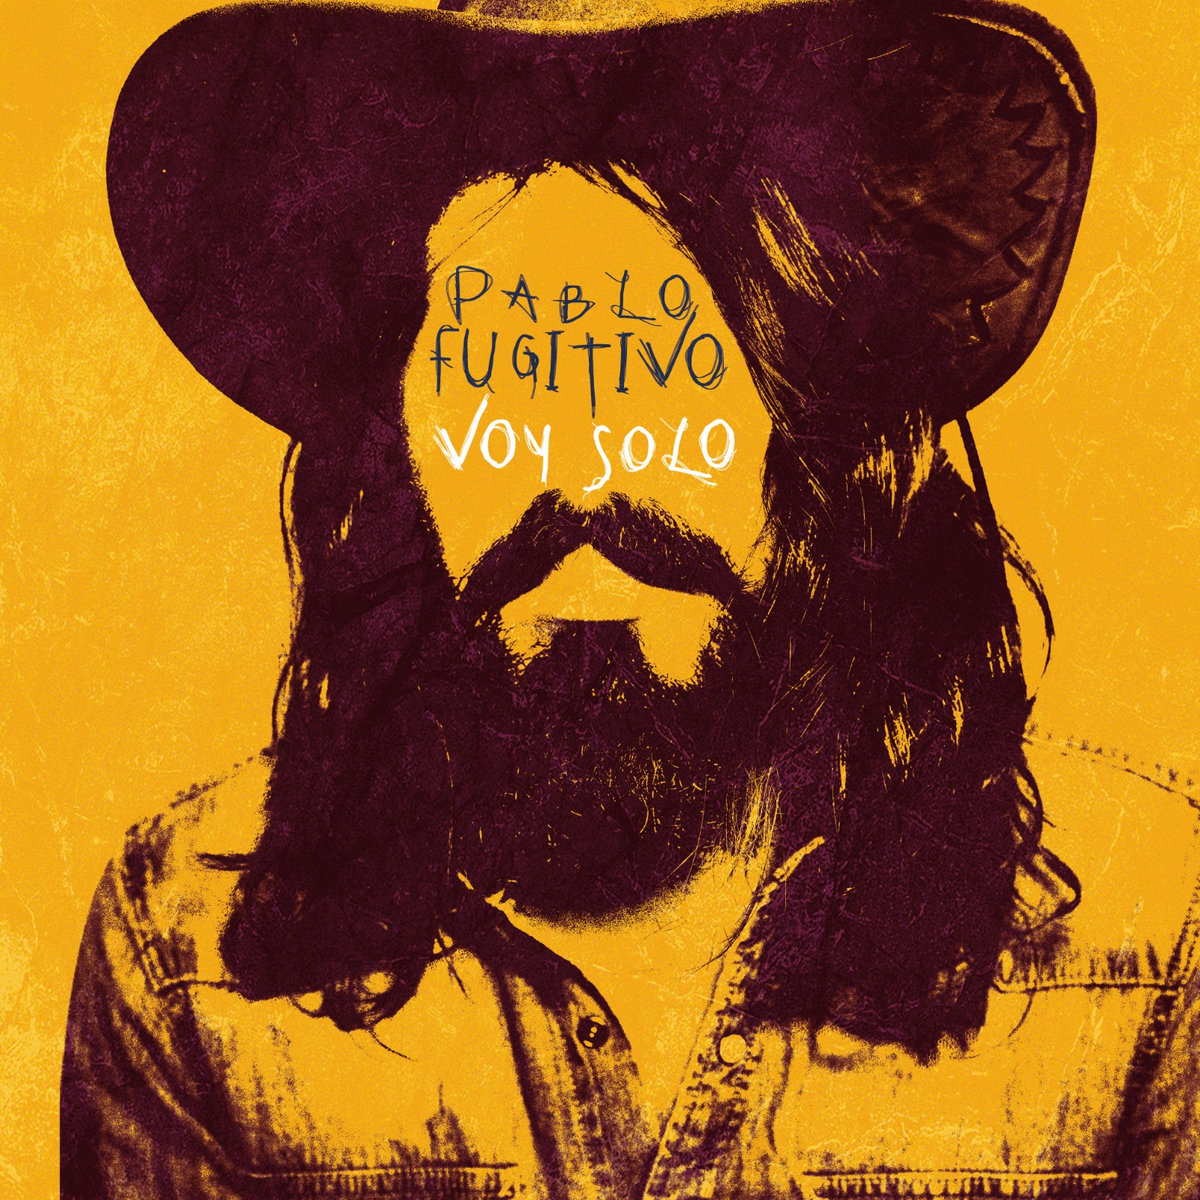 Voy Solo Pablo Fugitivo